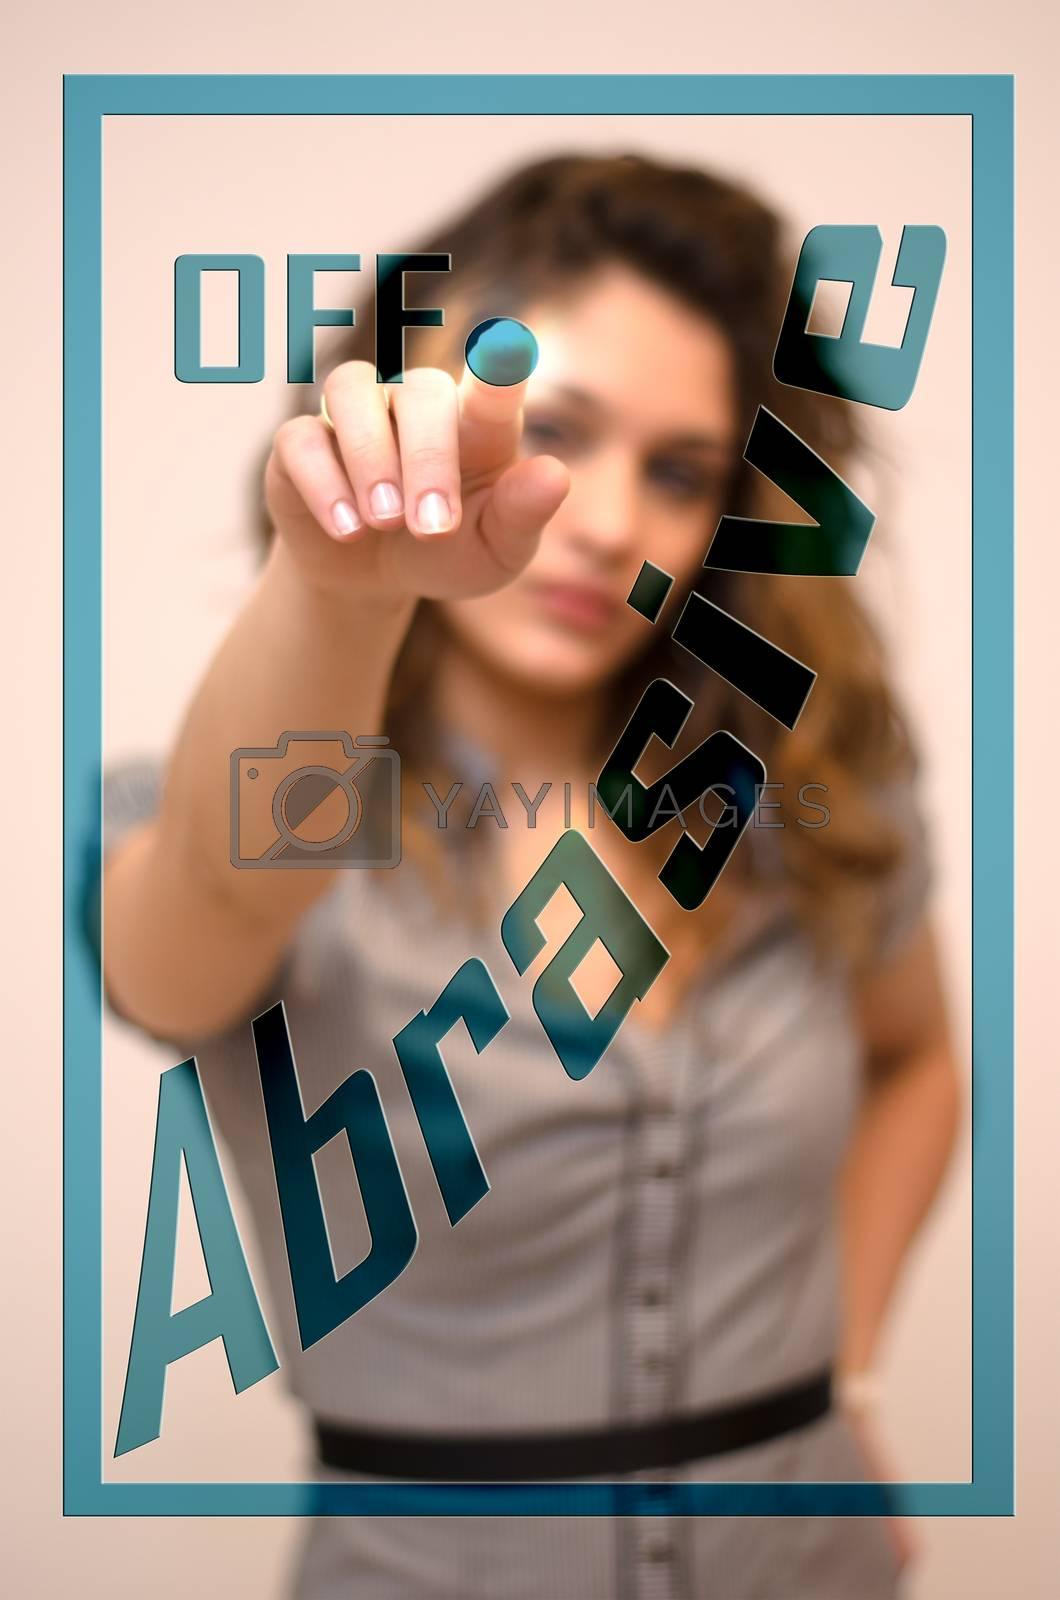 Royalty free image of anger management, turn off Abrasive  by vepar5